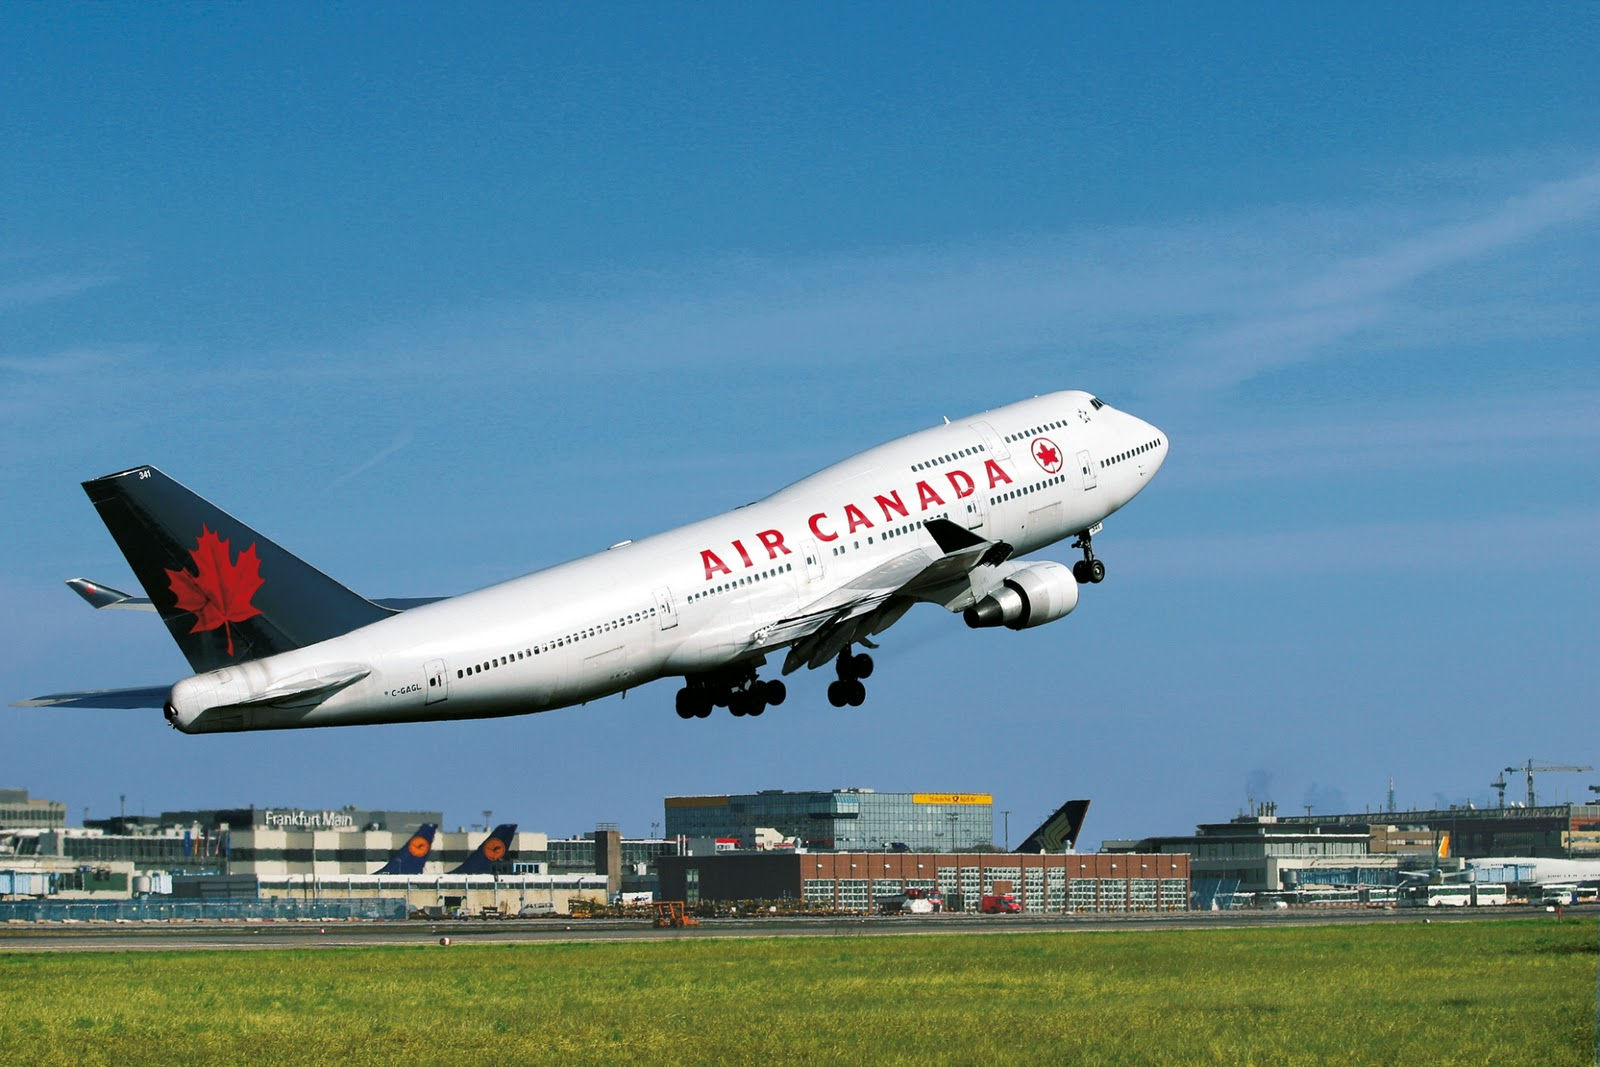 http://4.bp.blogspot.com/-7OrqZY1XEMM/TvCBd2HIp9I/AAAAAAAAHHg/5-VDX2s9B7s/s1600/air_canada_boeing_747.jpg